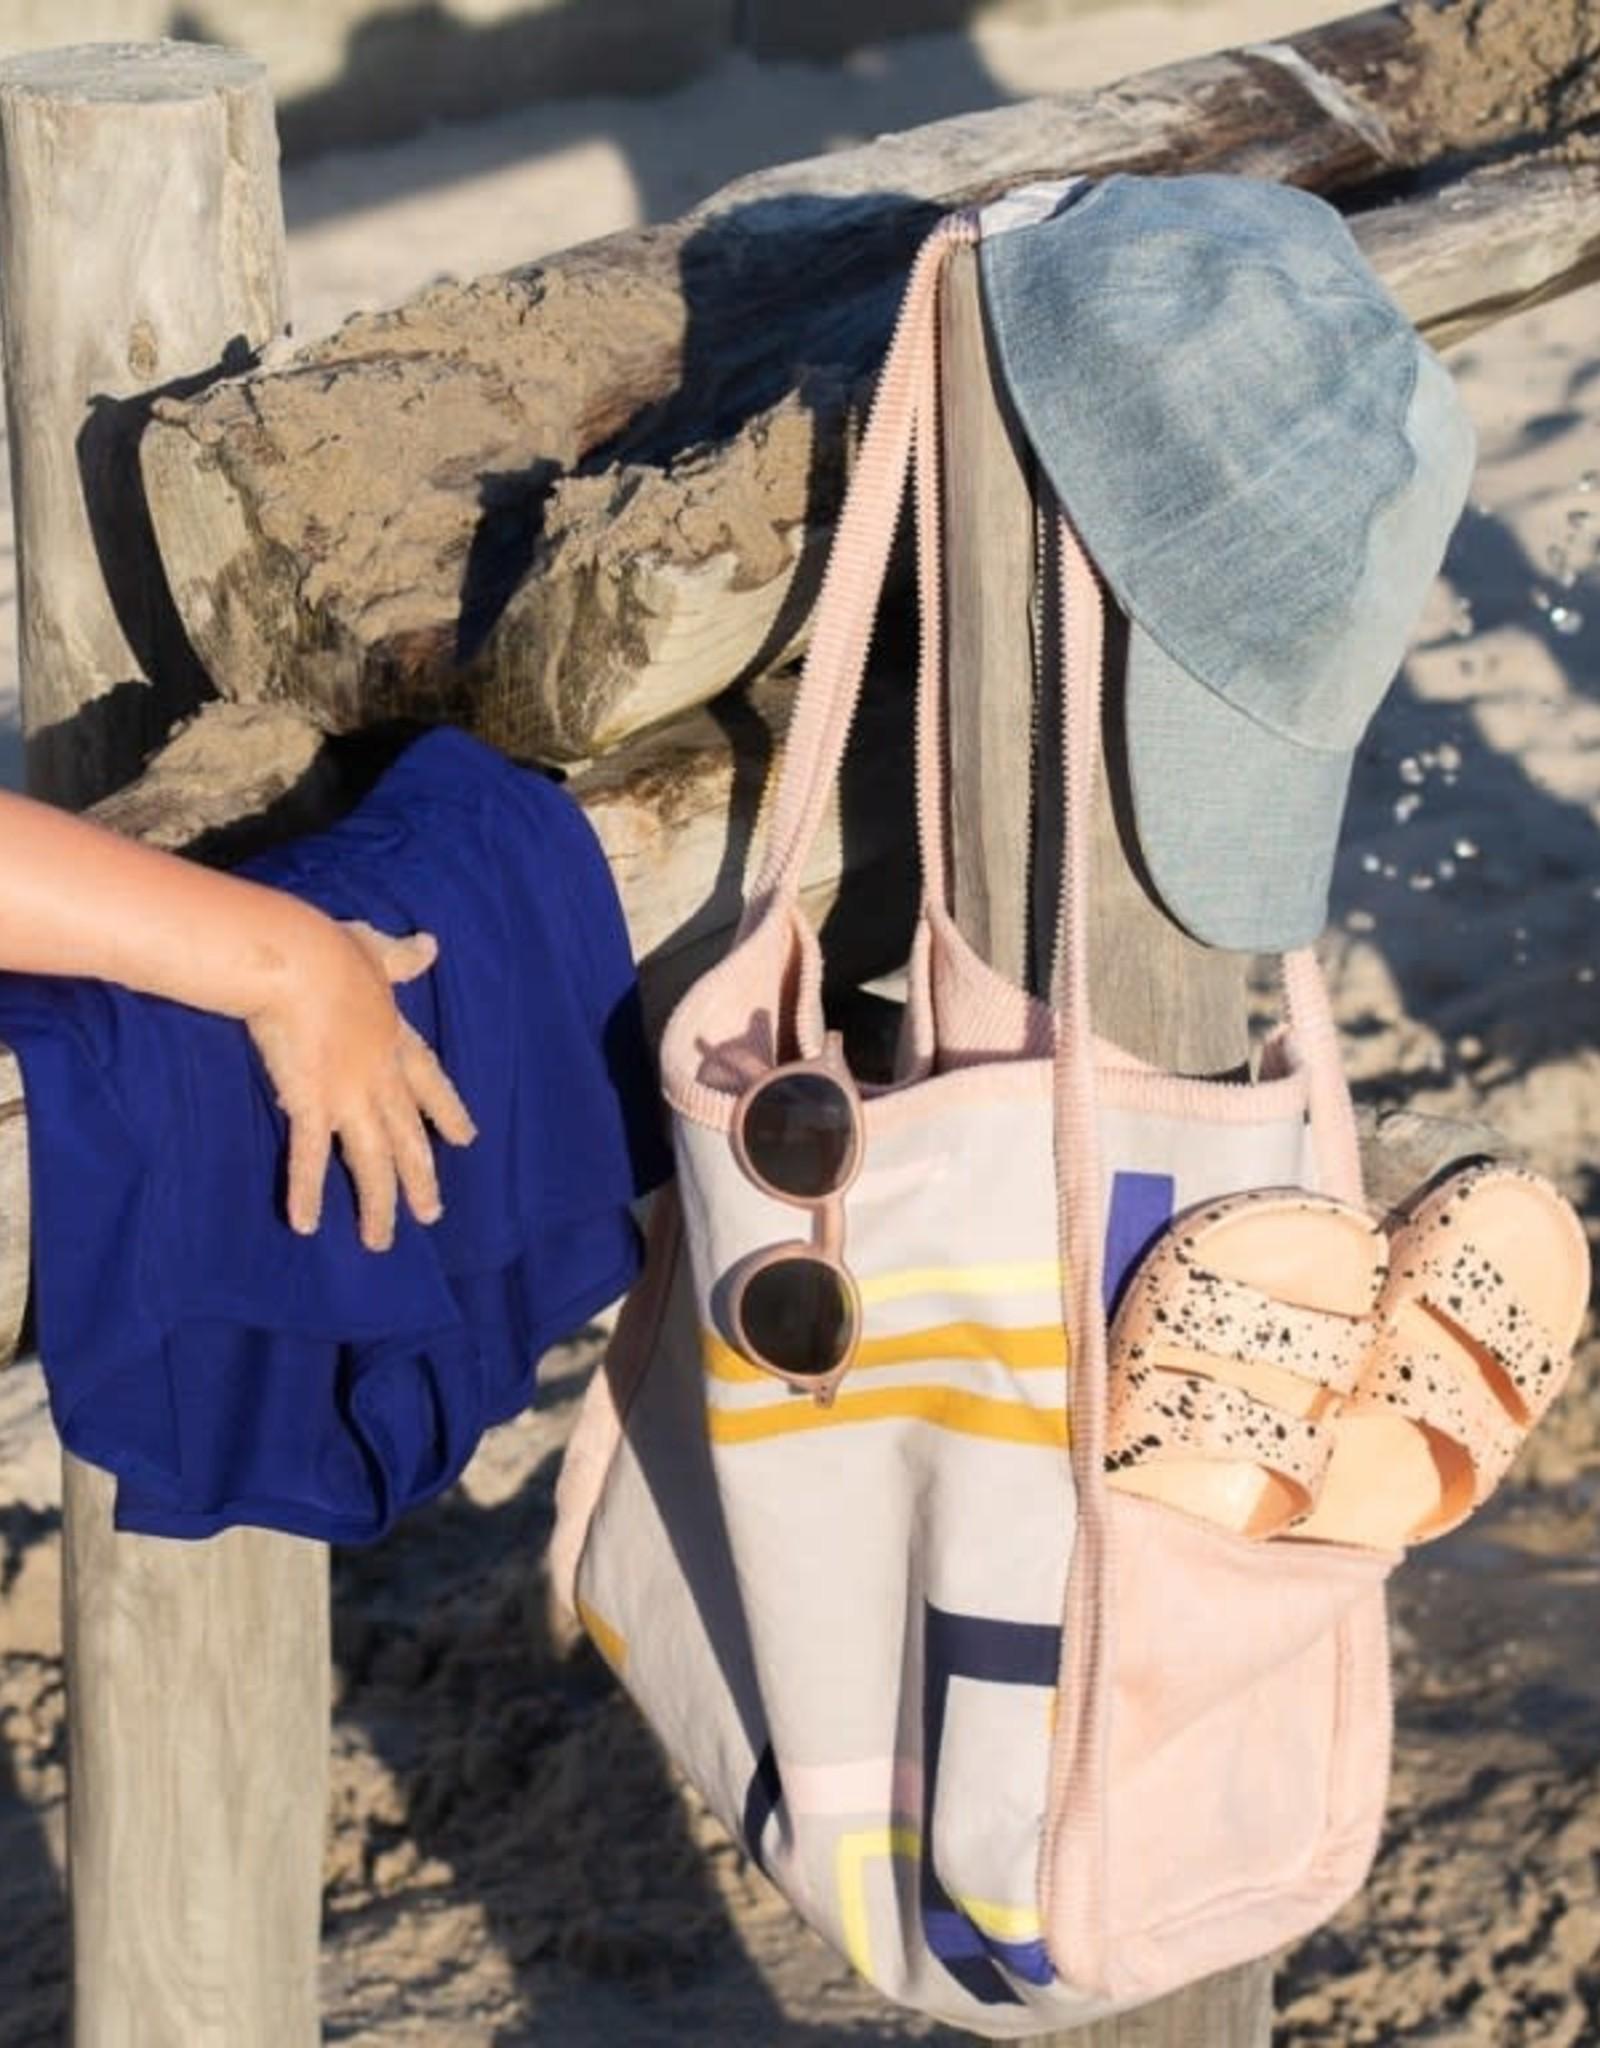 Wisj Wisj Naaipatroon Beach bundle (Jua pet, Steph short, Tobi tote)